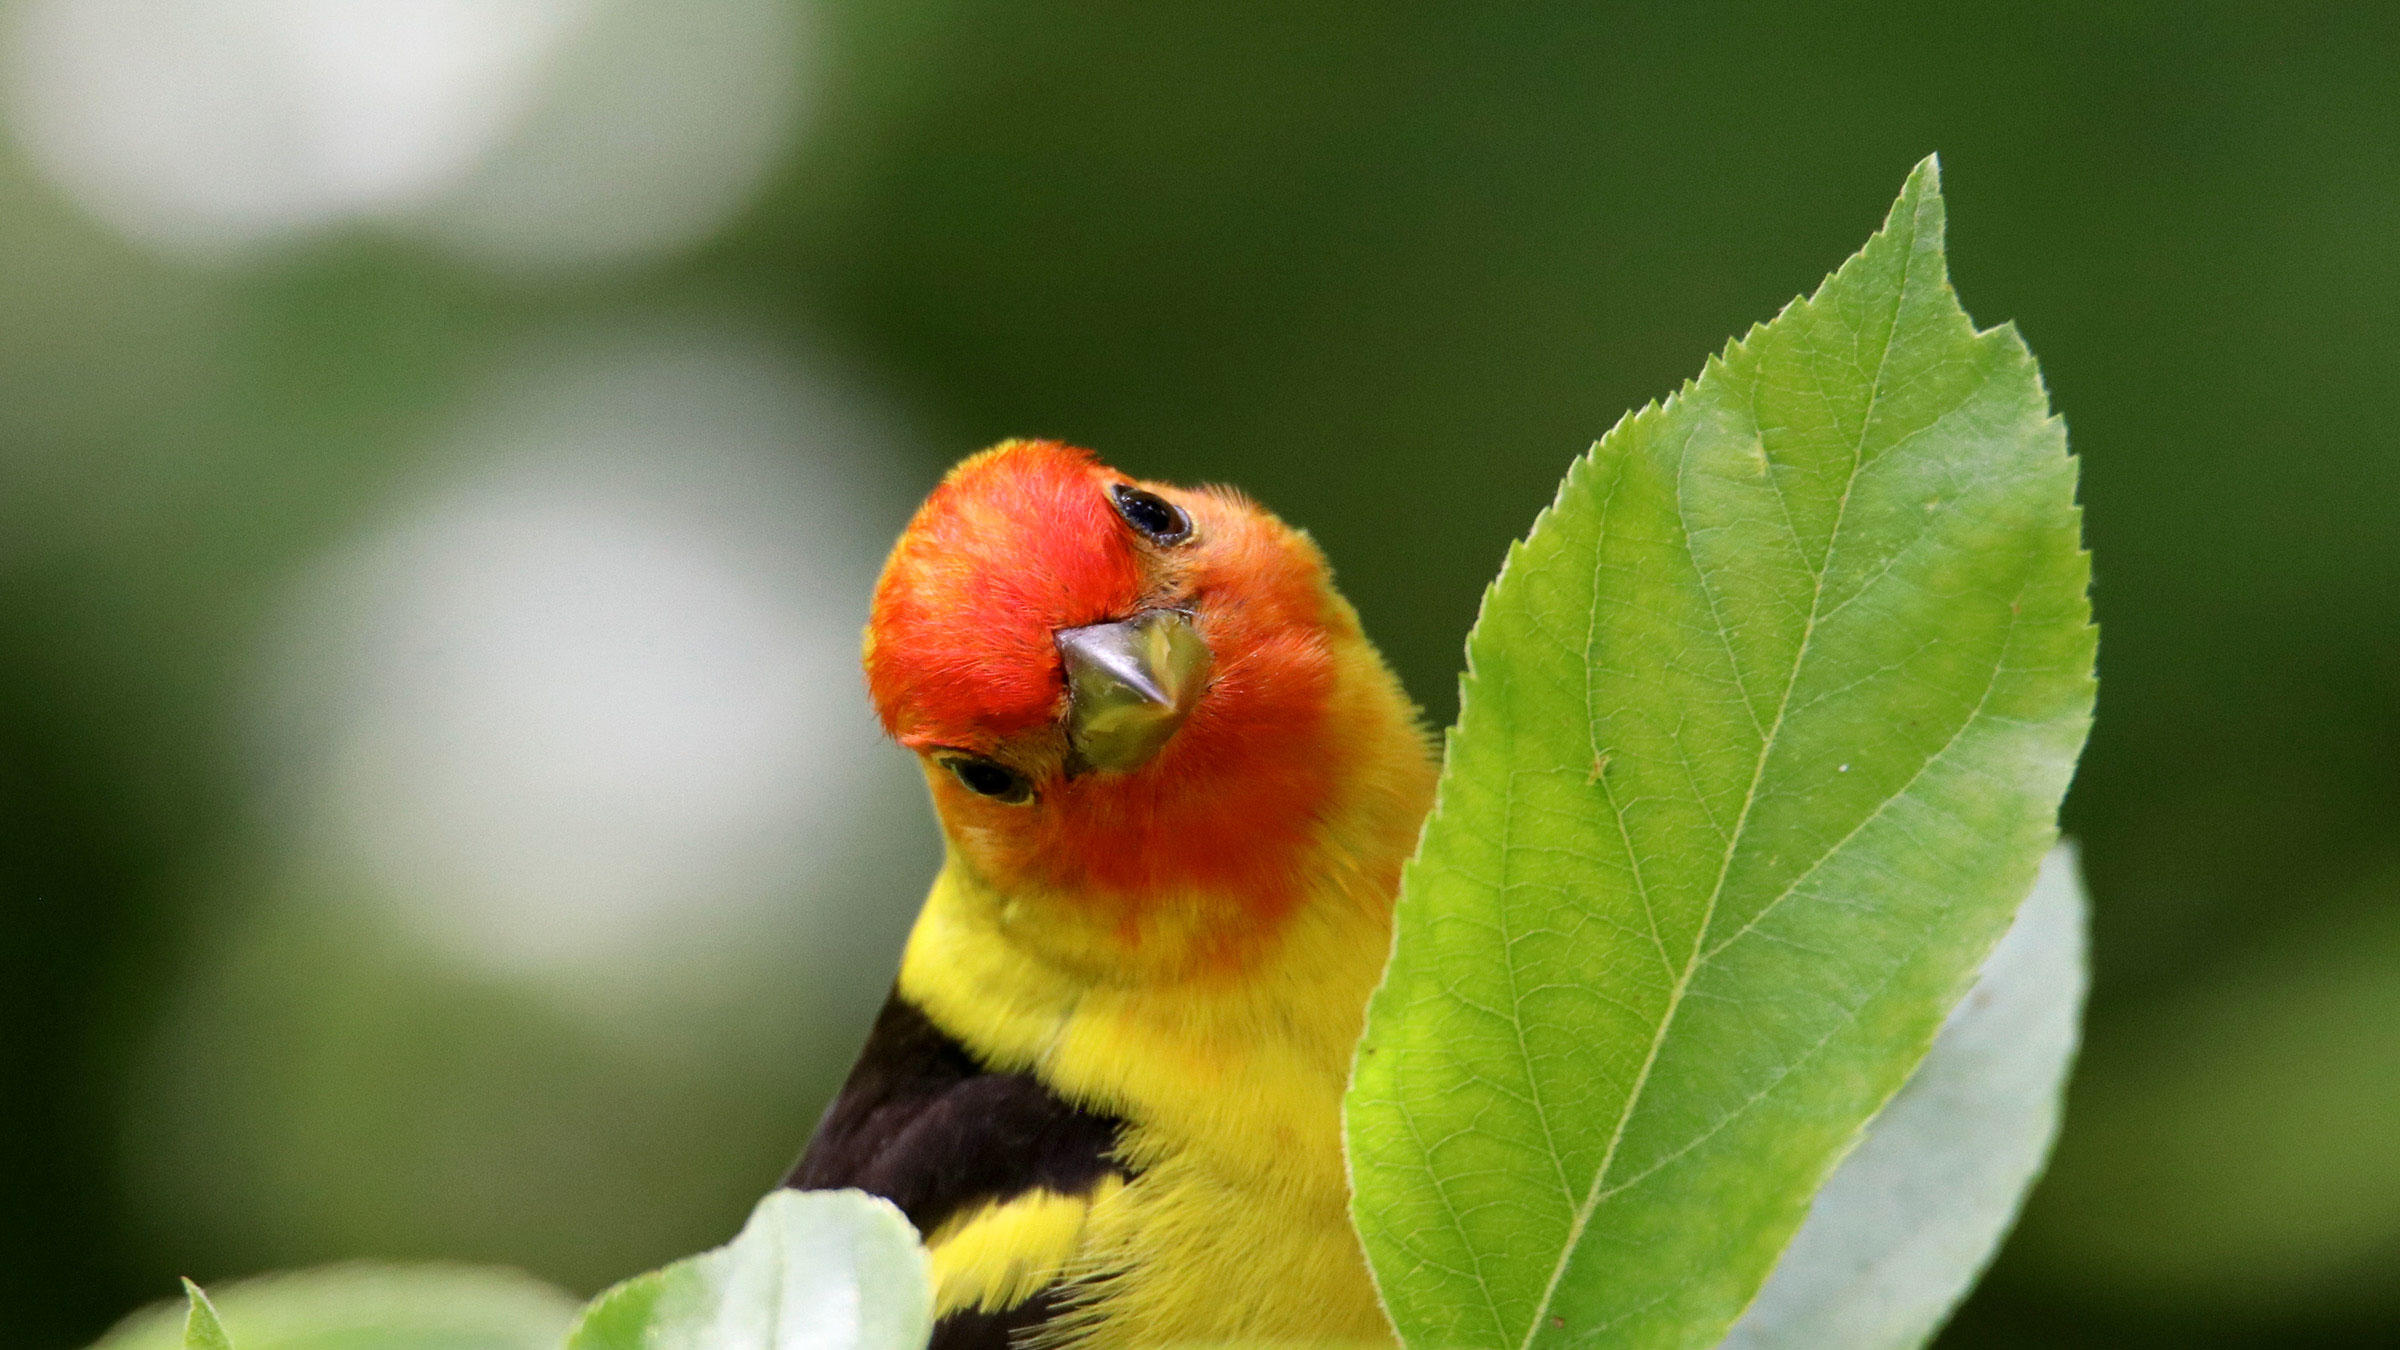 Closeup of a male Western Tanager. Photo: Janet Stevens/Audubon Photography Awards